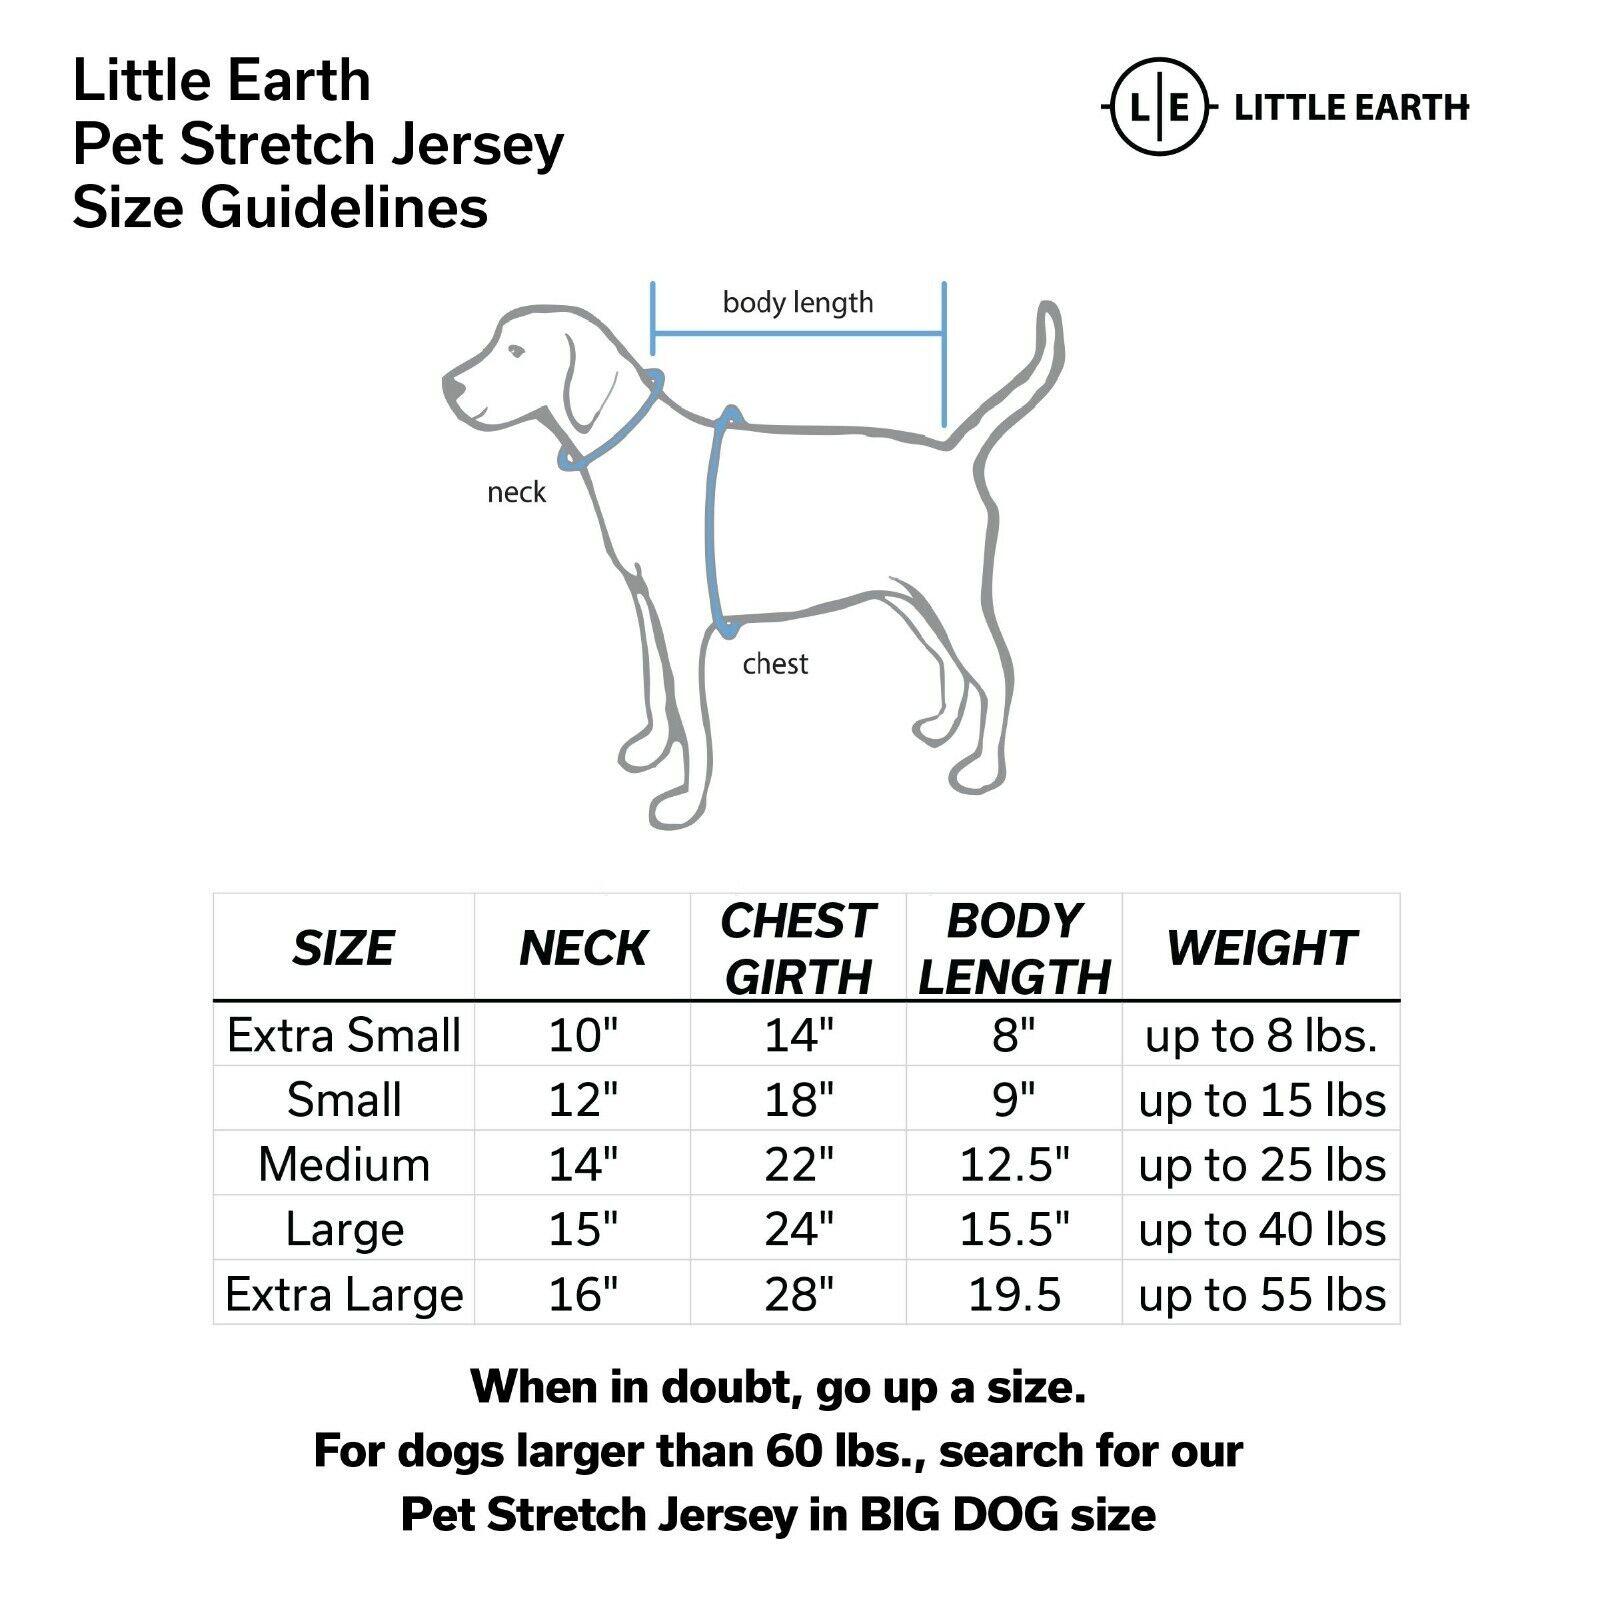 KENTUCKY WILDCATS Little Earth NCAA Custom Pet Stretch Jersey Sizes XS-BIG DOG - $34.99